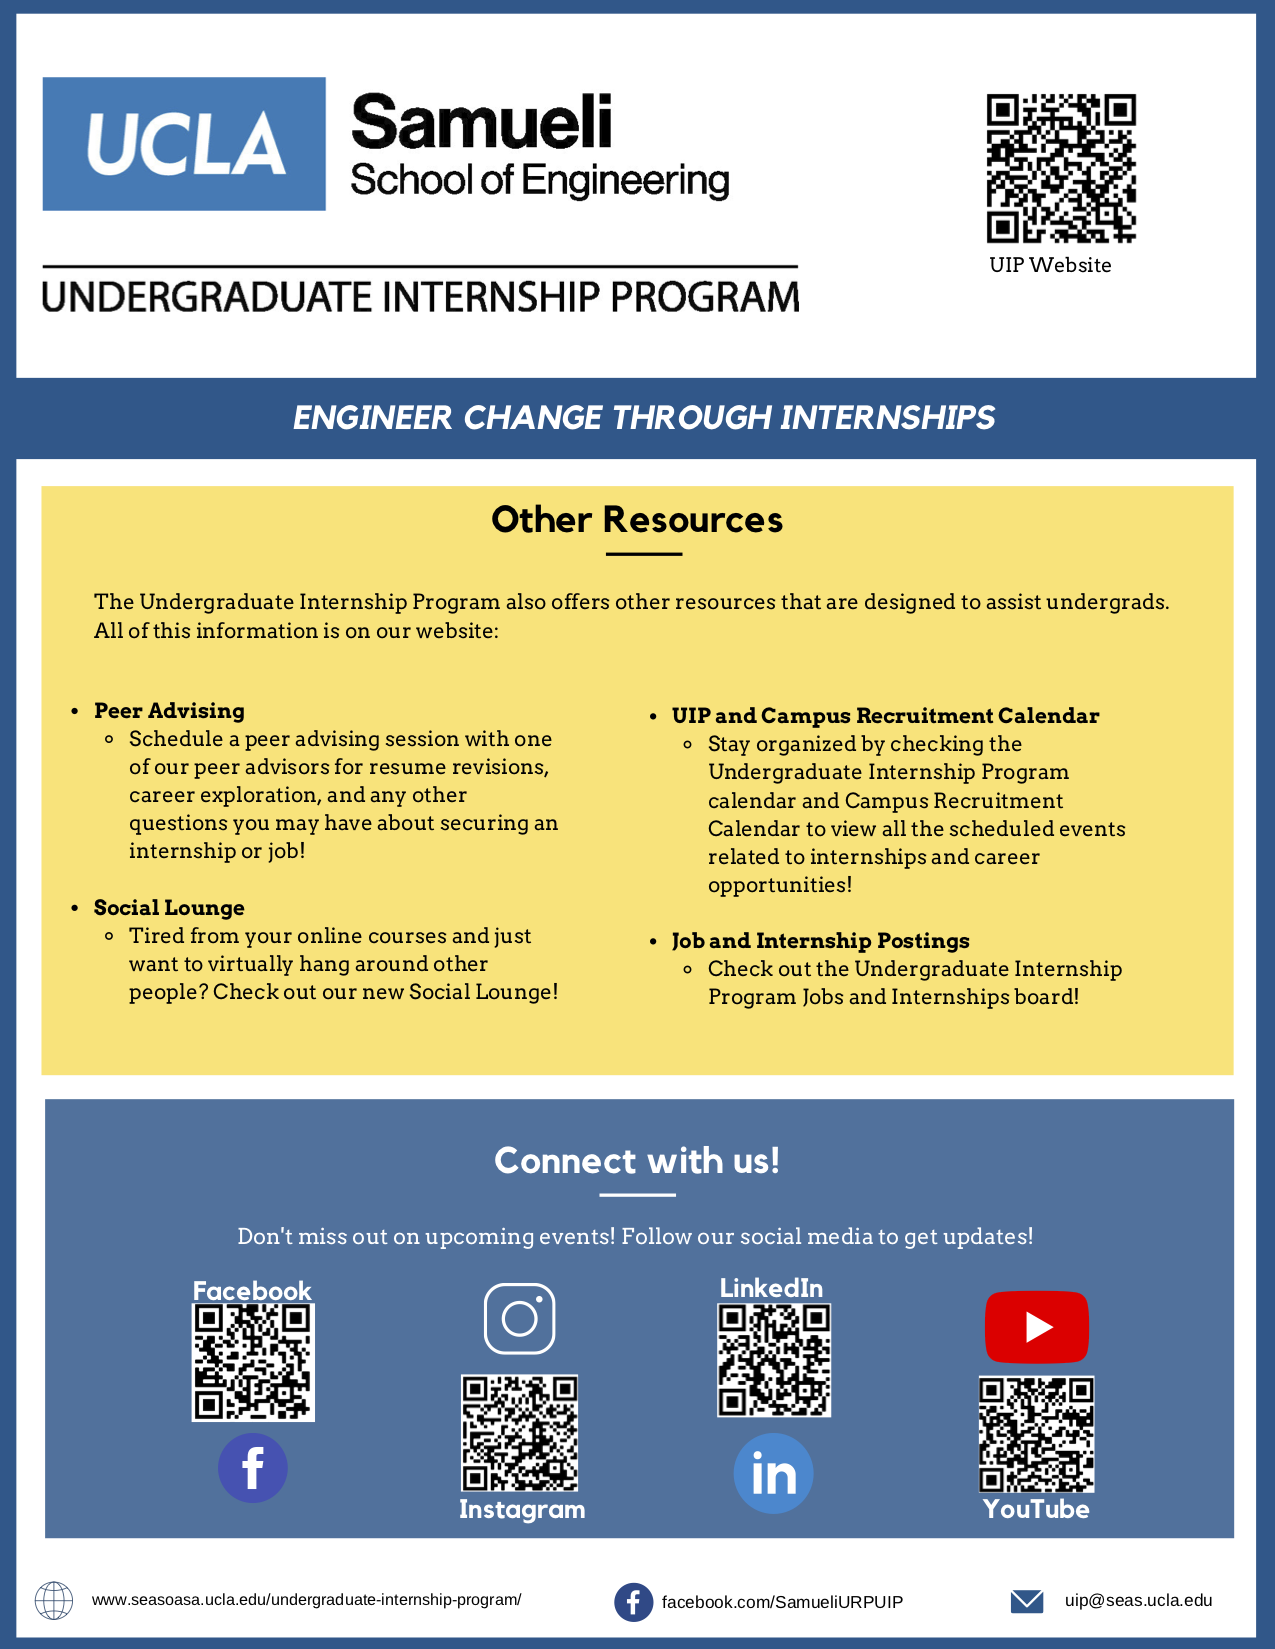 What is the Undergraduate Internship Program?